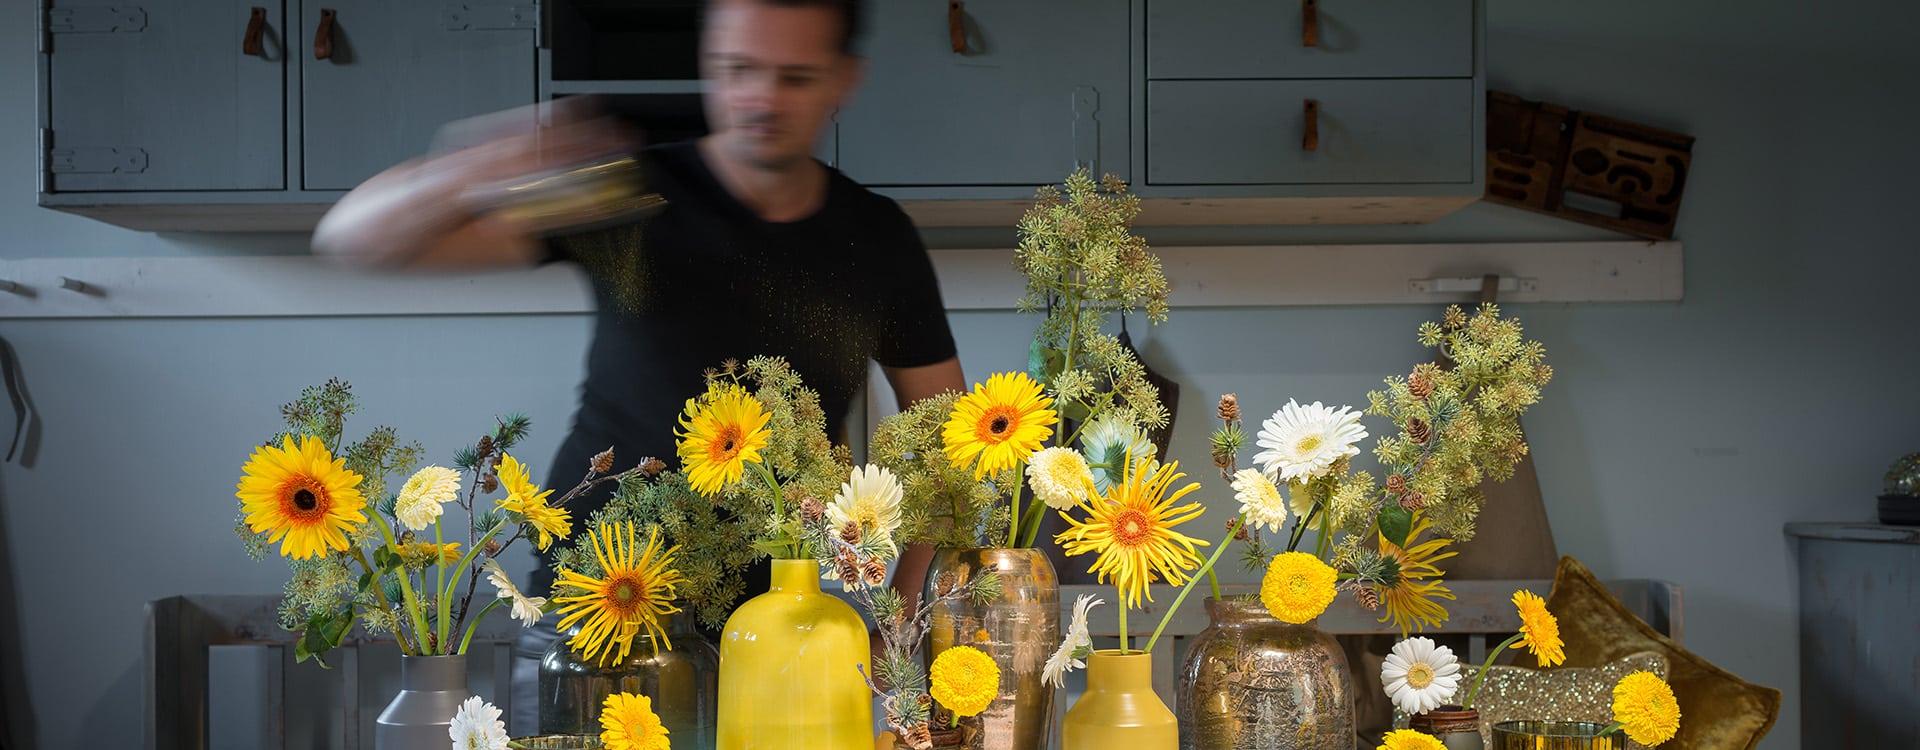 2dezign-floral-design-decoratie